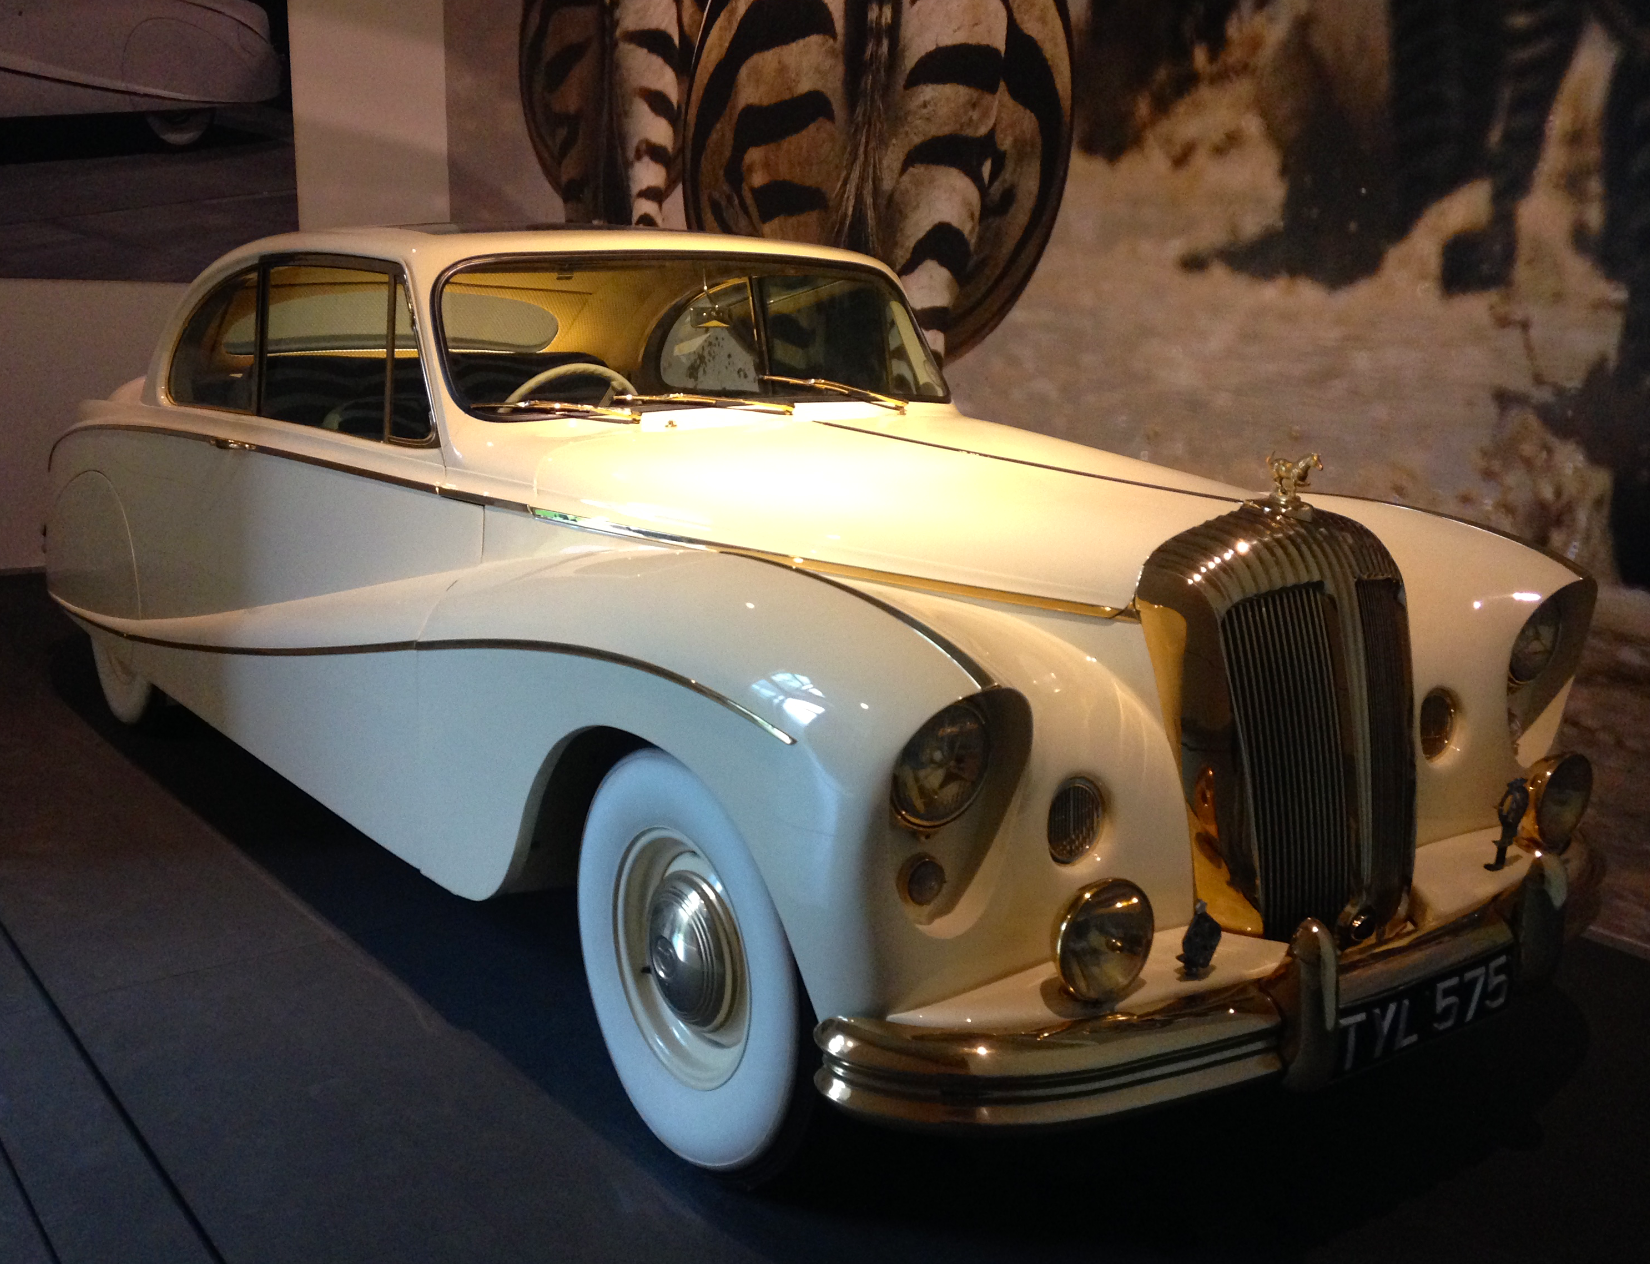 1955 Daimler DK 400 'Golden Zebra' Coupe